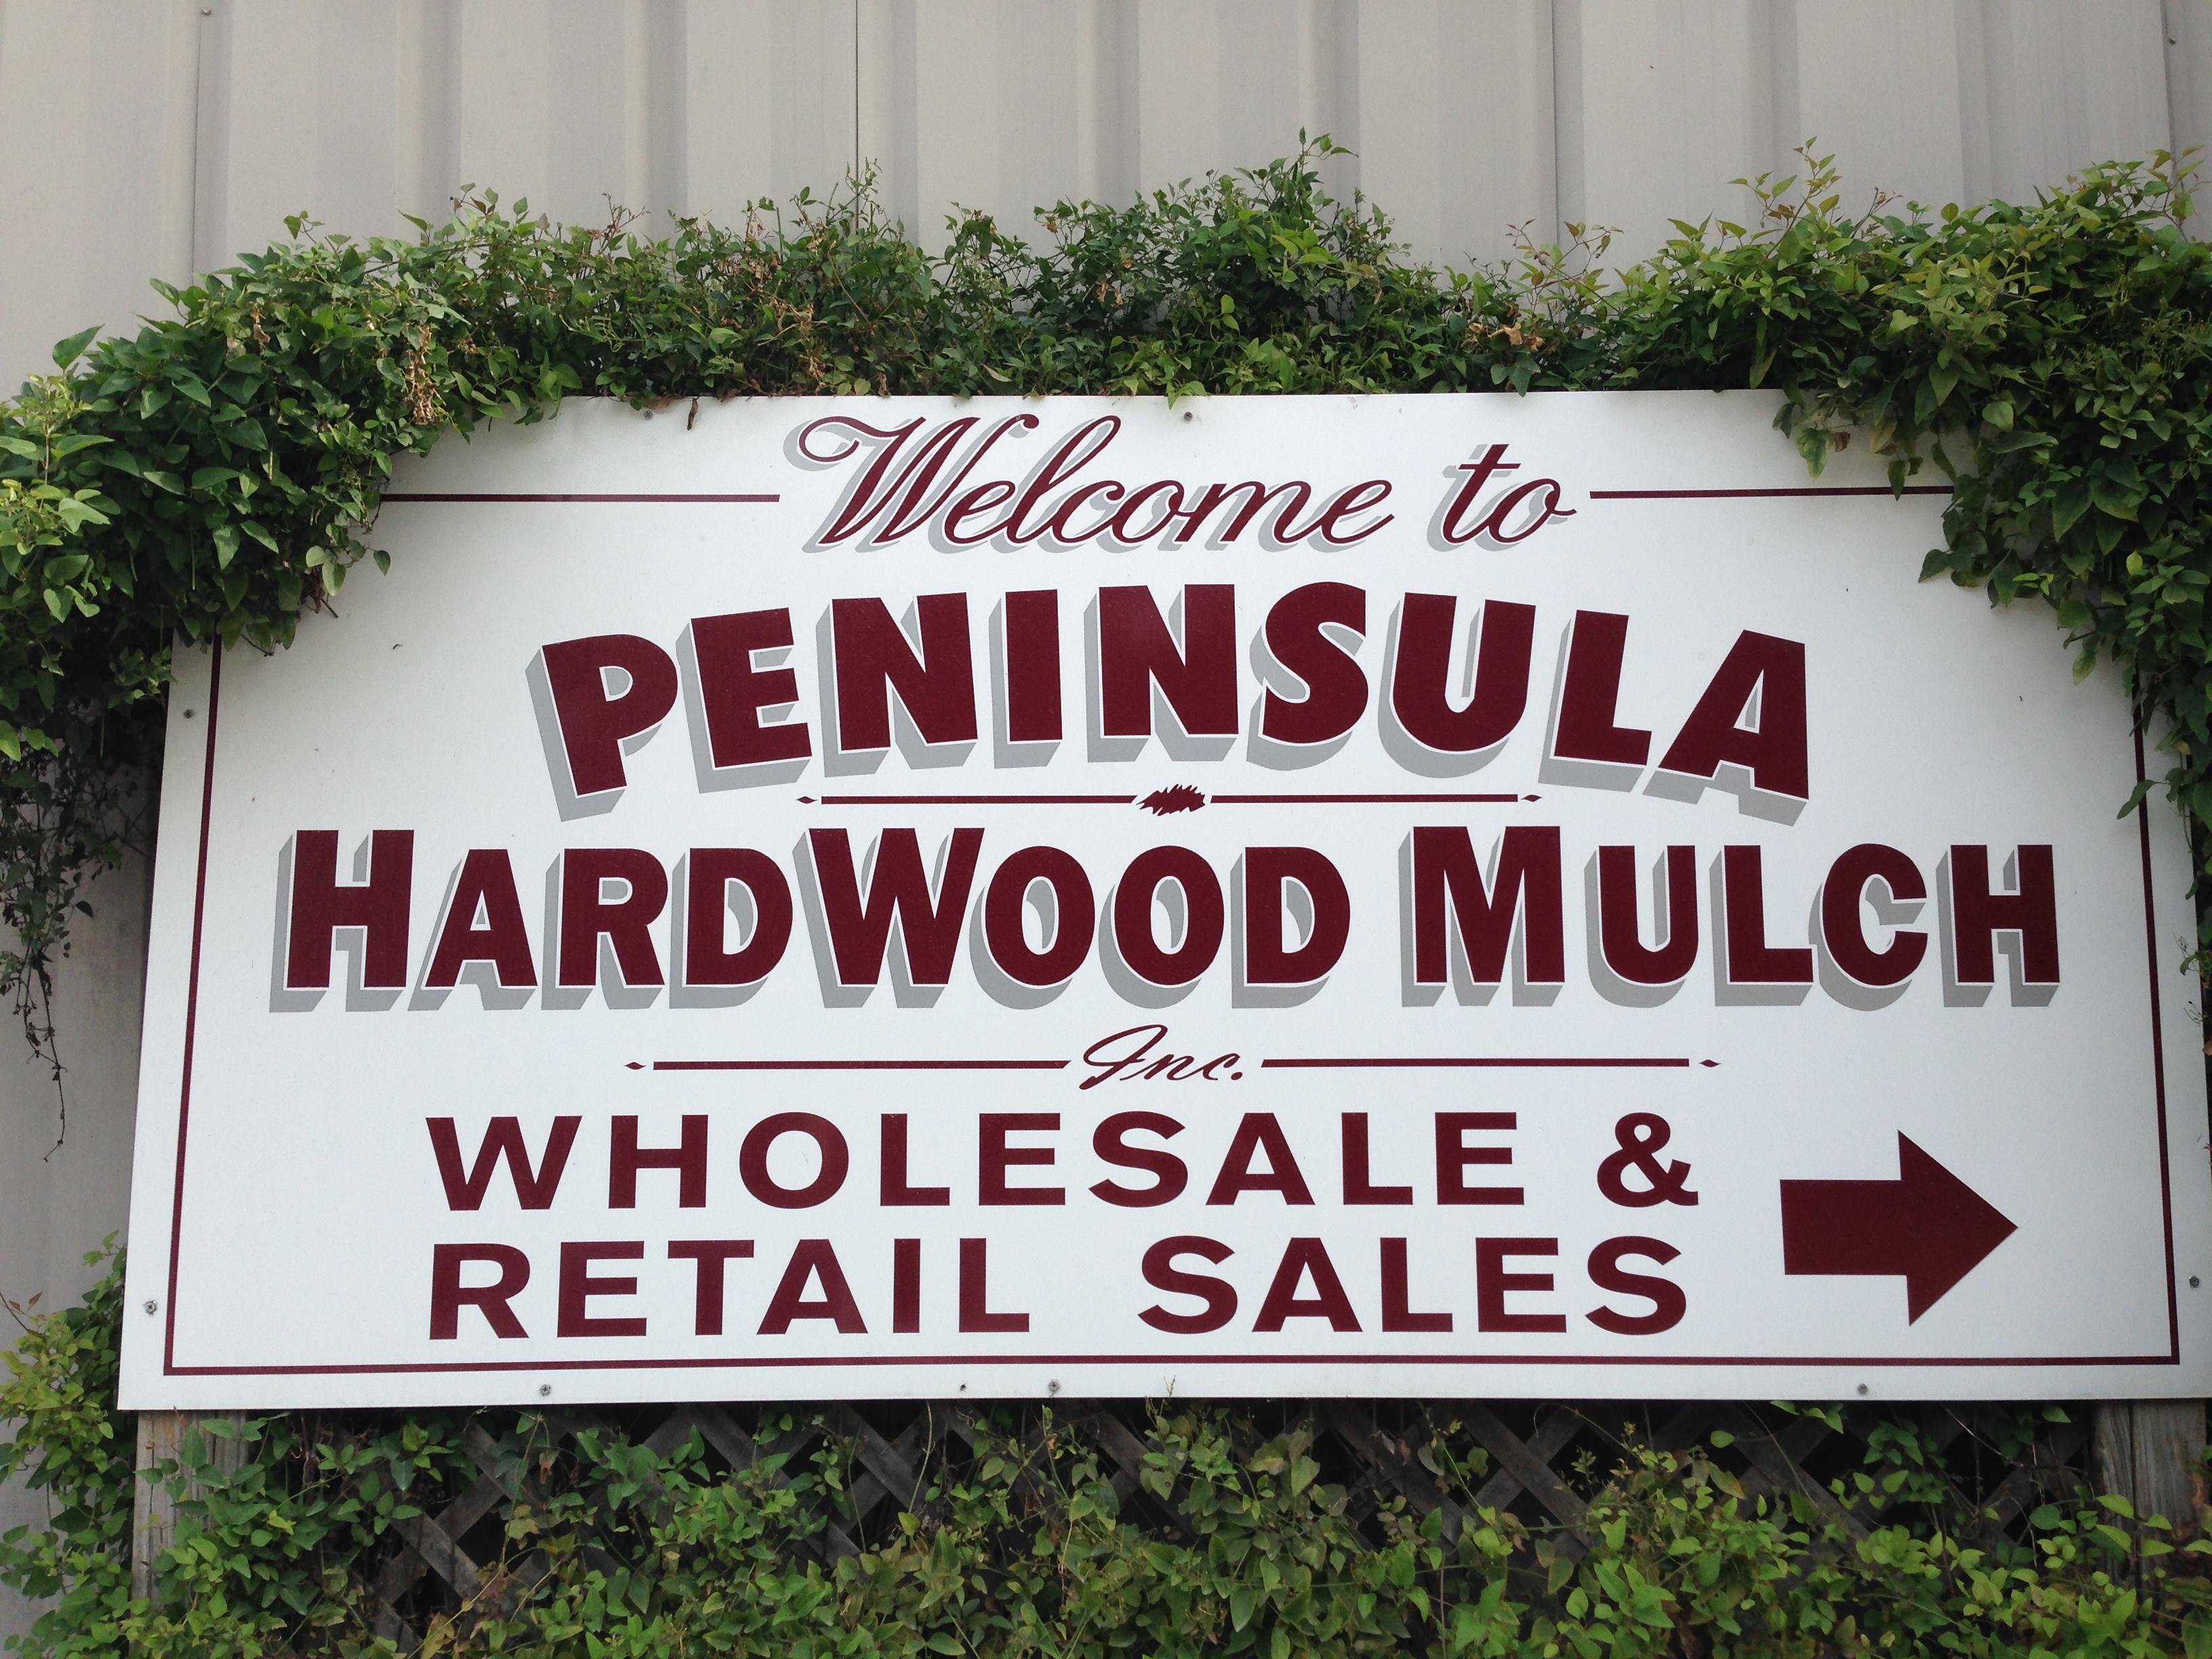 Peninsula Hardwood Mulch 715 Lakeside Dr Yorktown Va